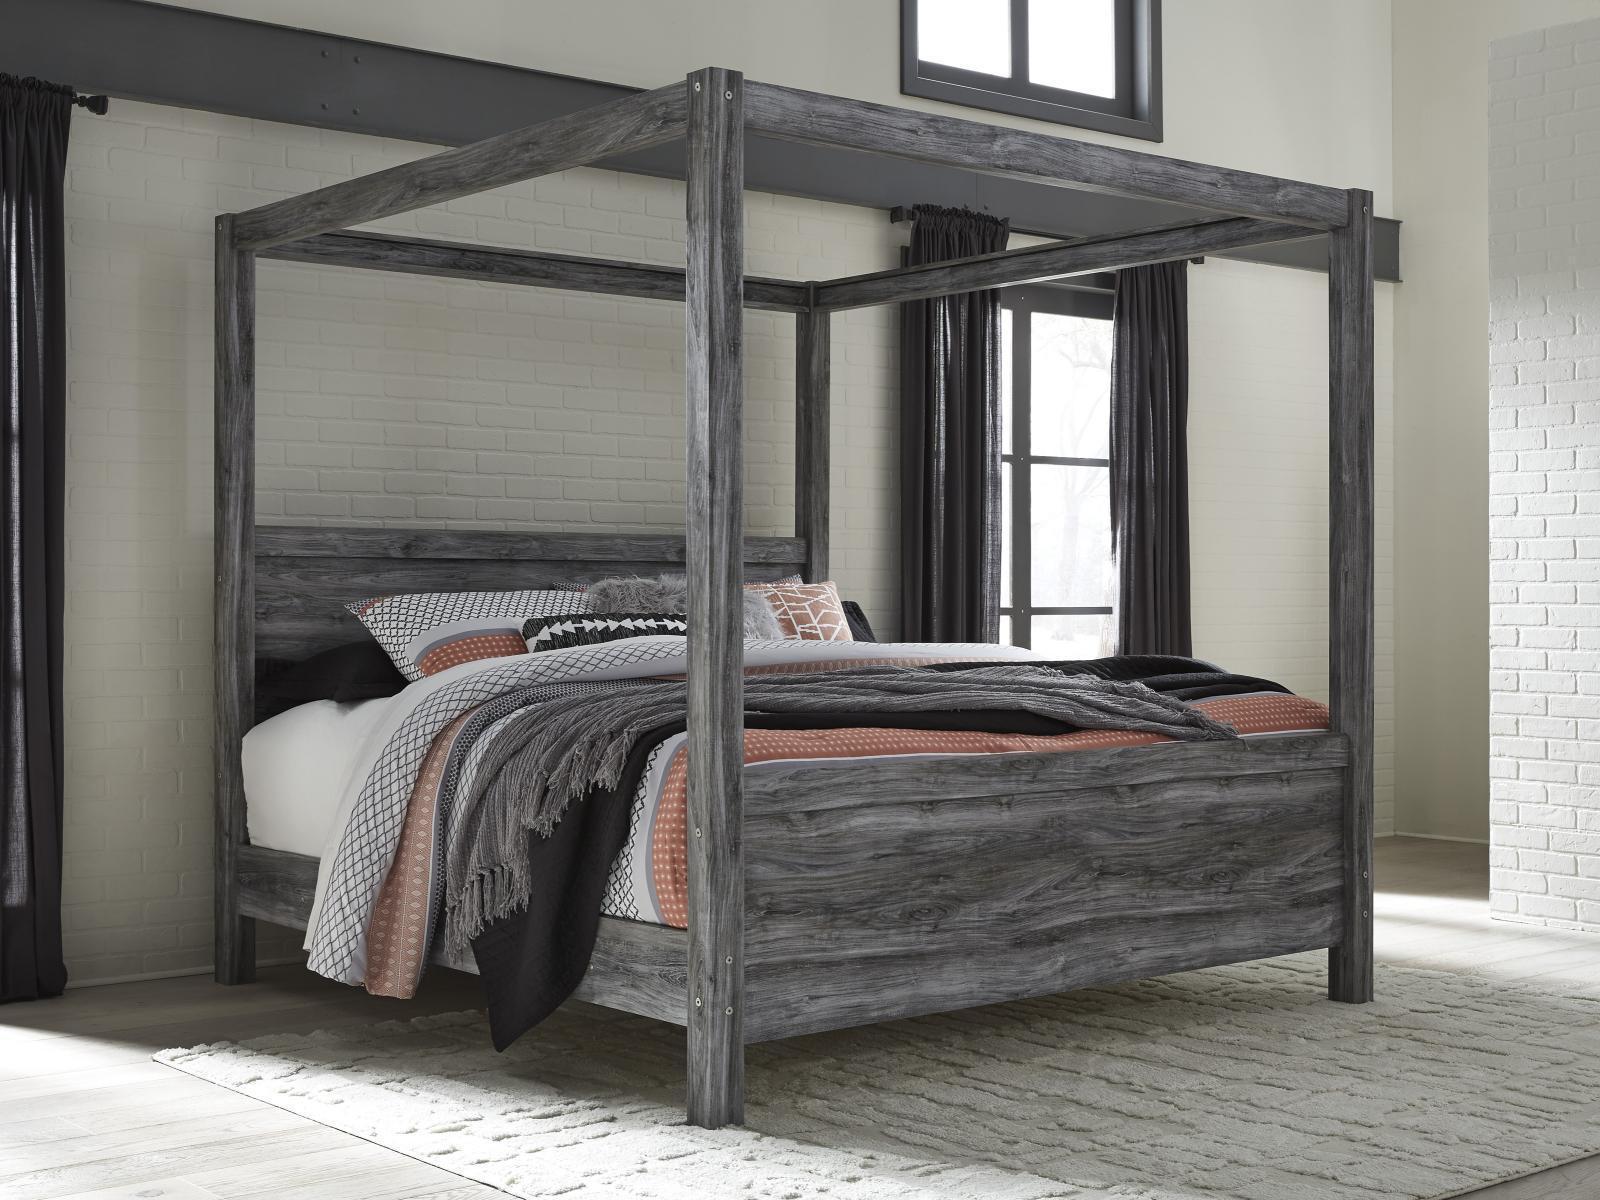 ashley baystorm b221 king size canopy bedroom set 6pcs in